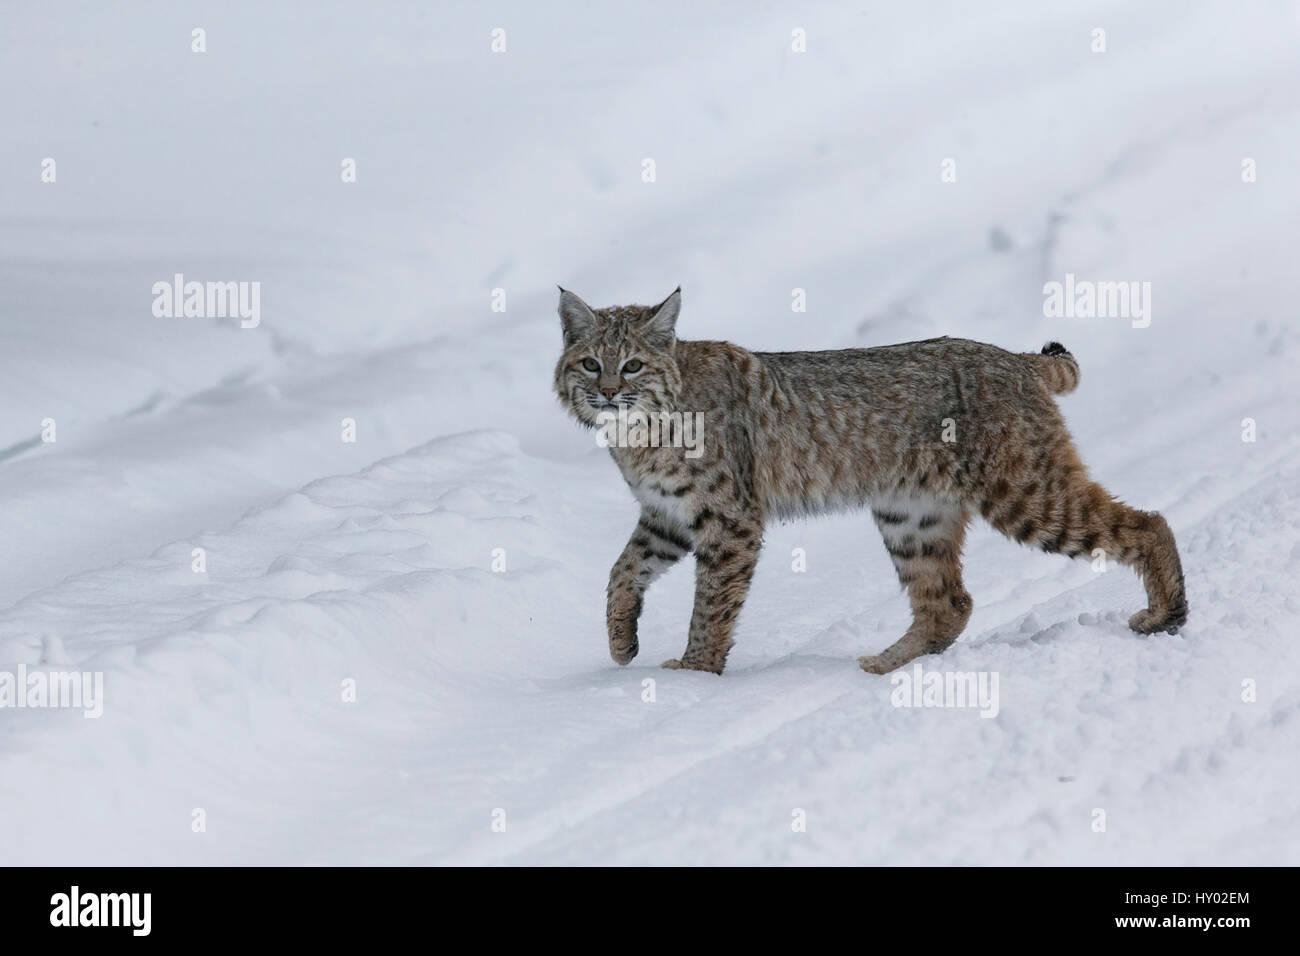 Bobcat (Lynx rufus) pausing in winter snow, Yellowstone, USA. January. - Stock Image